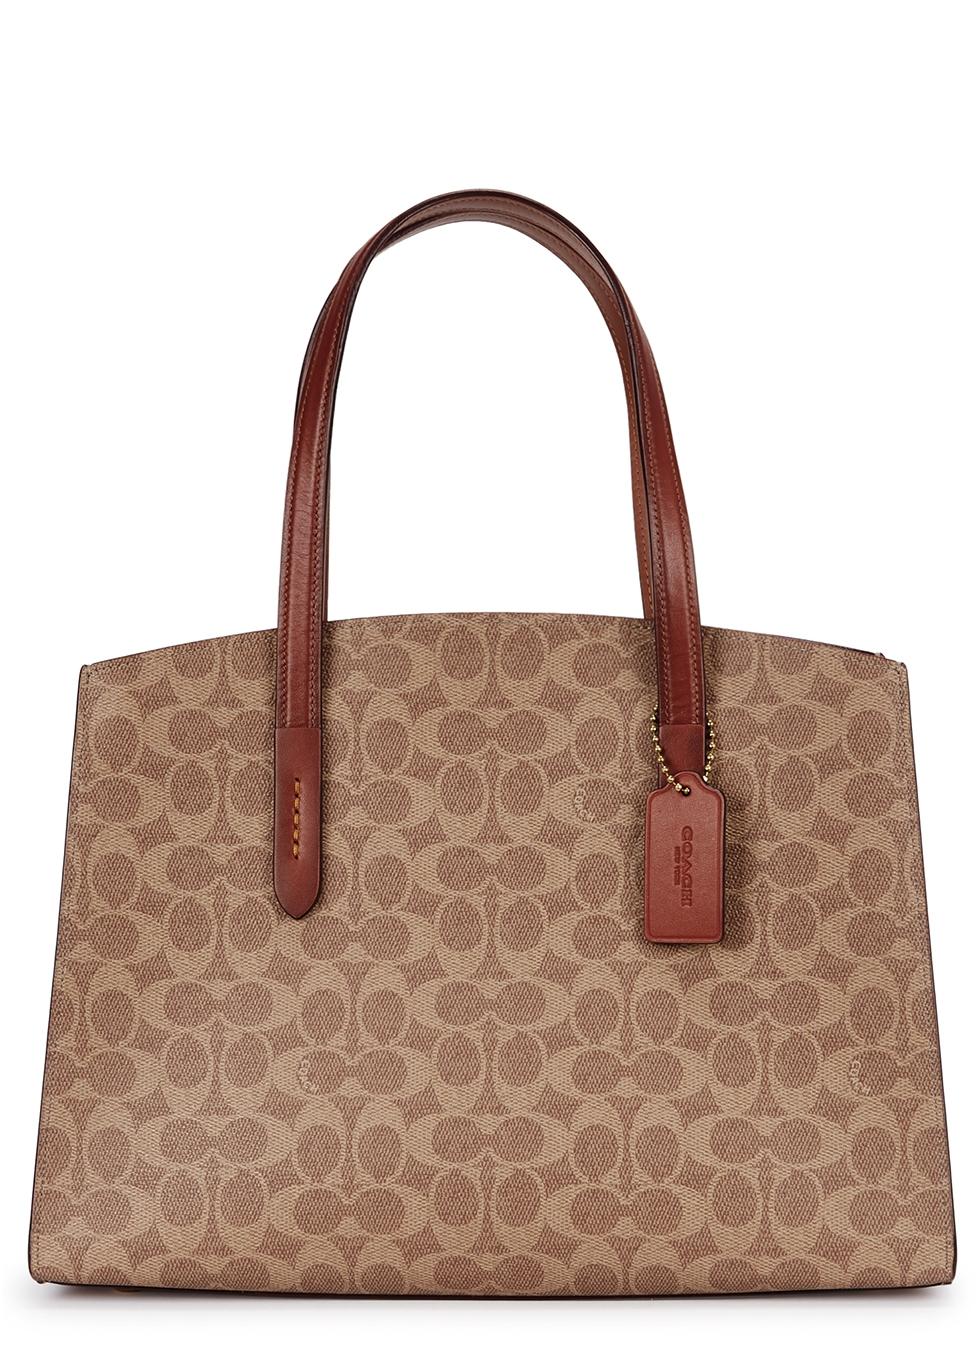 Charlie tan leather top-handle bag - Coach